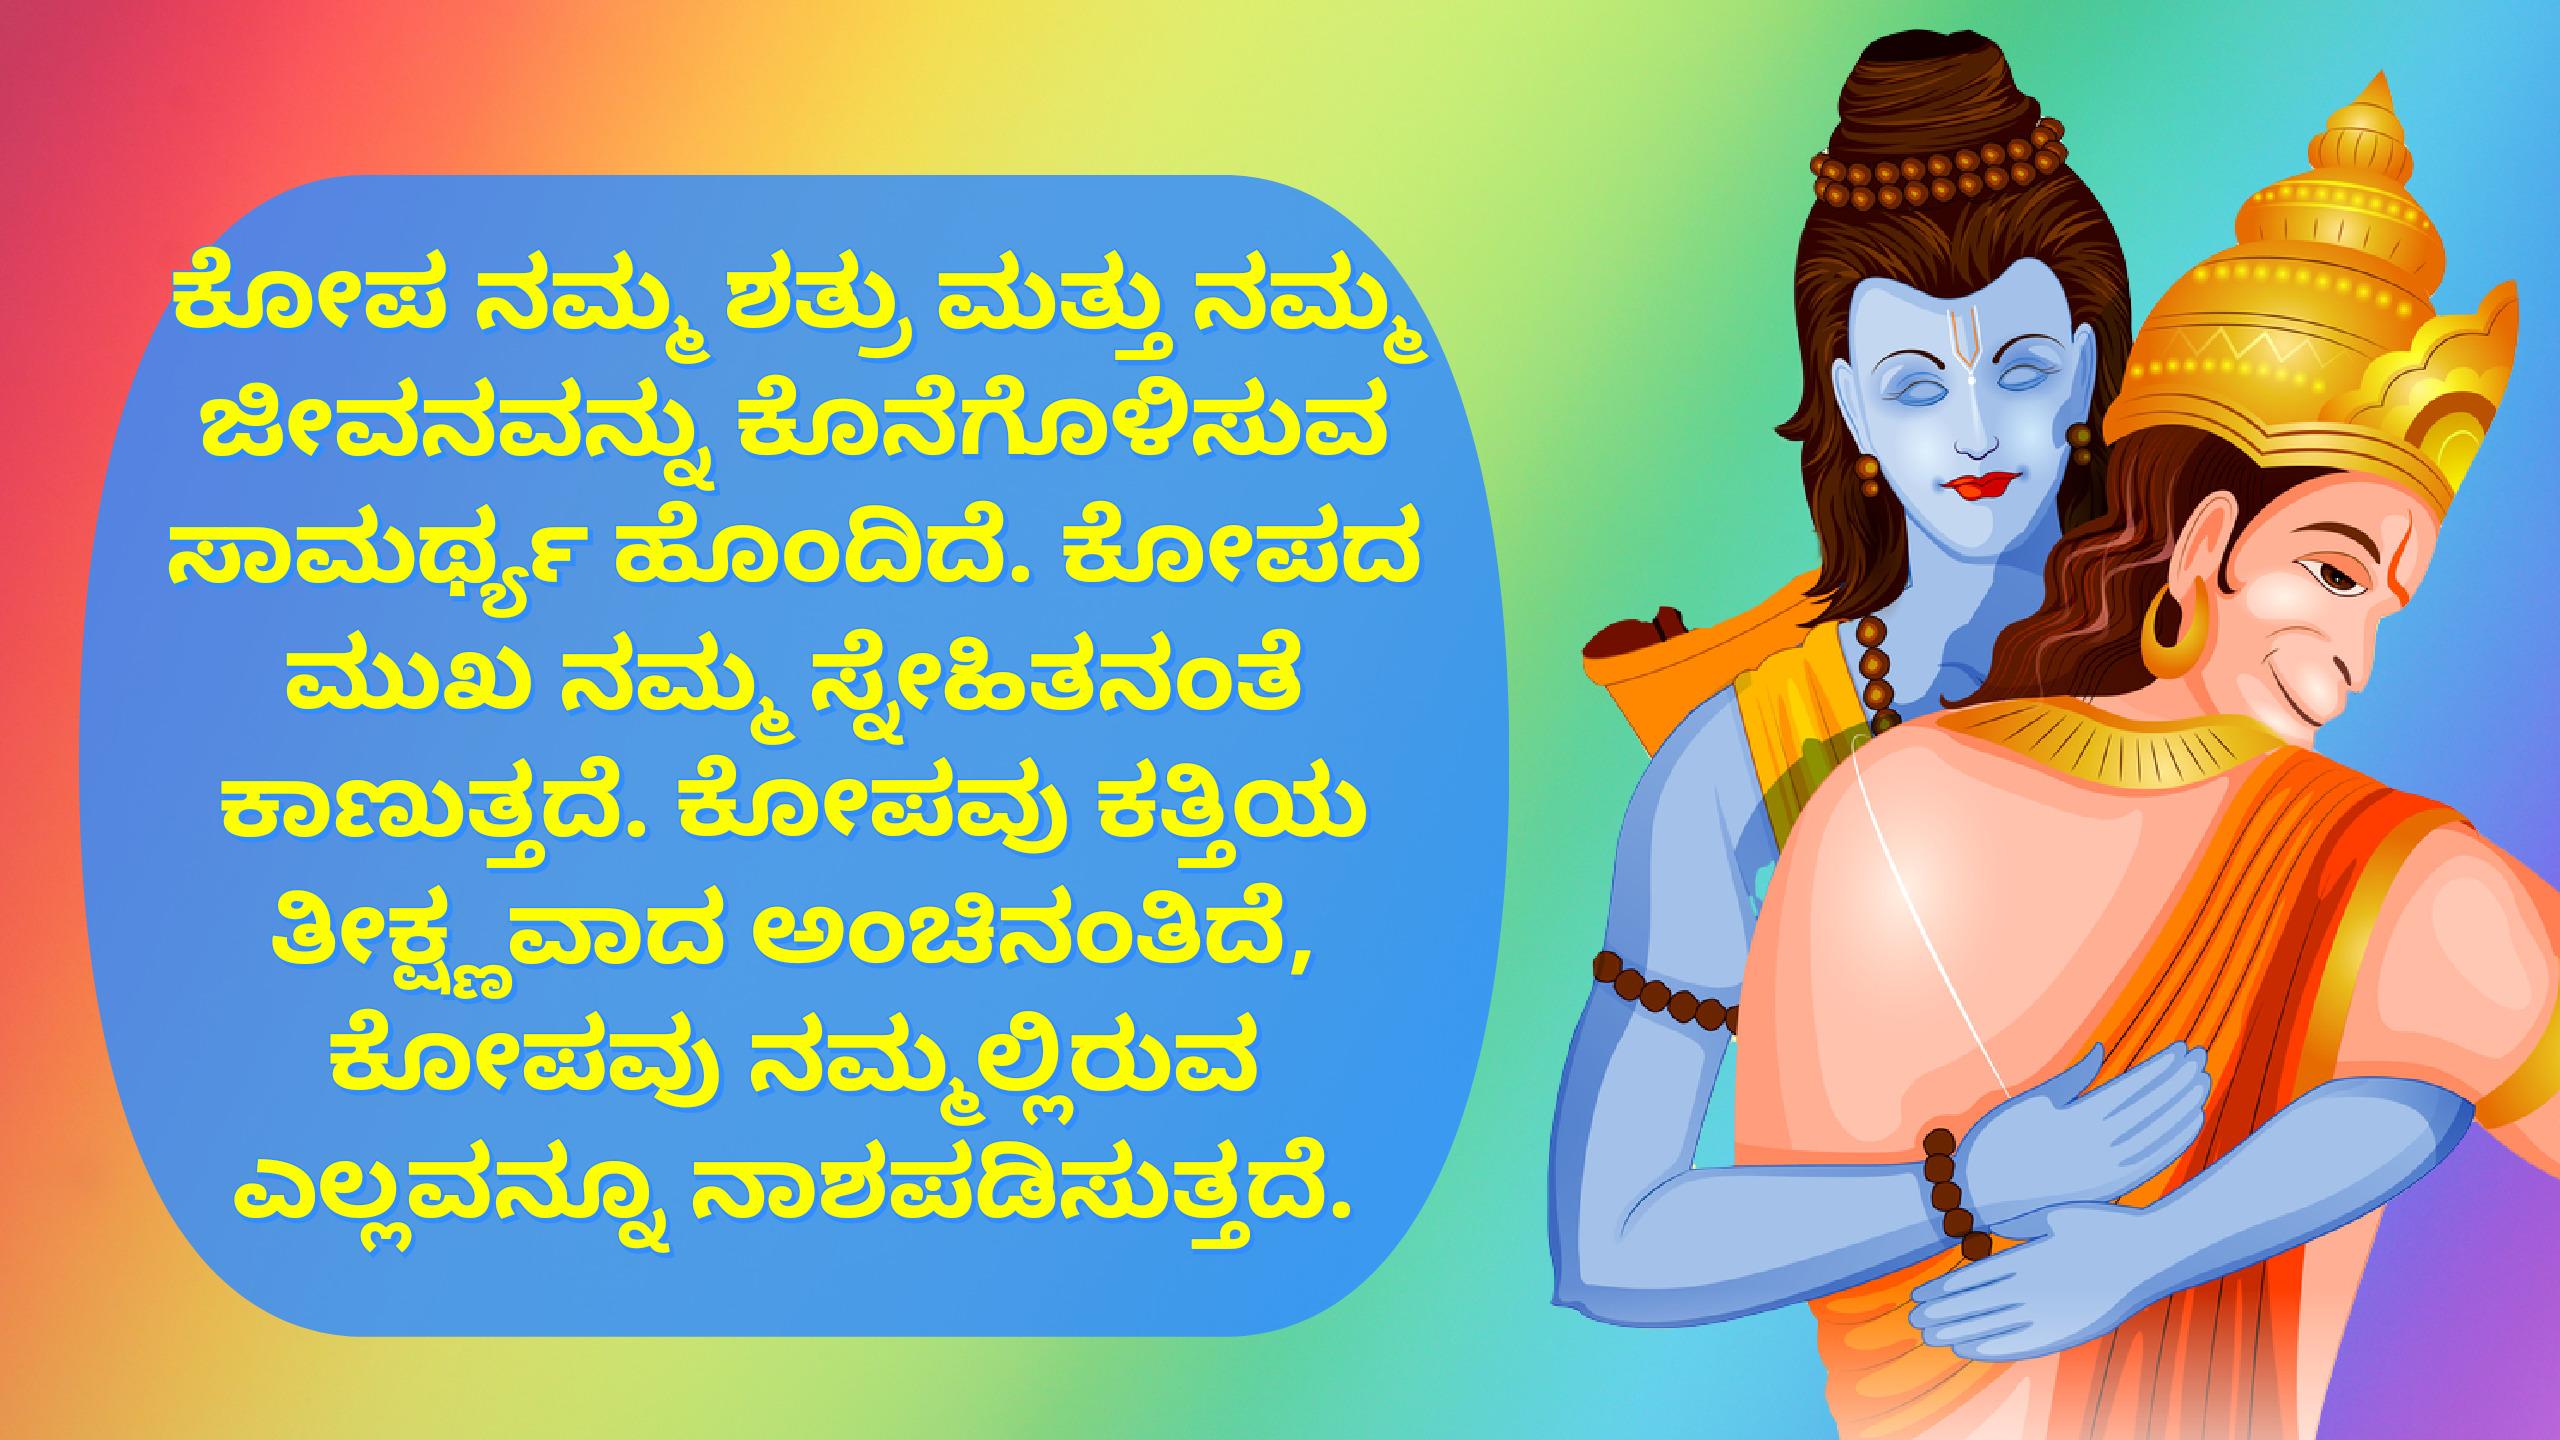 9. Shree Ram Quotes in Kannada